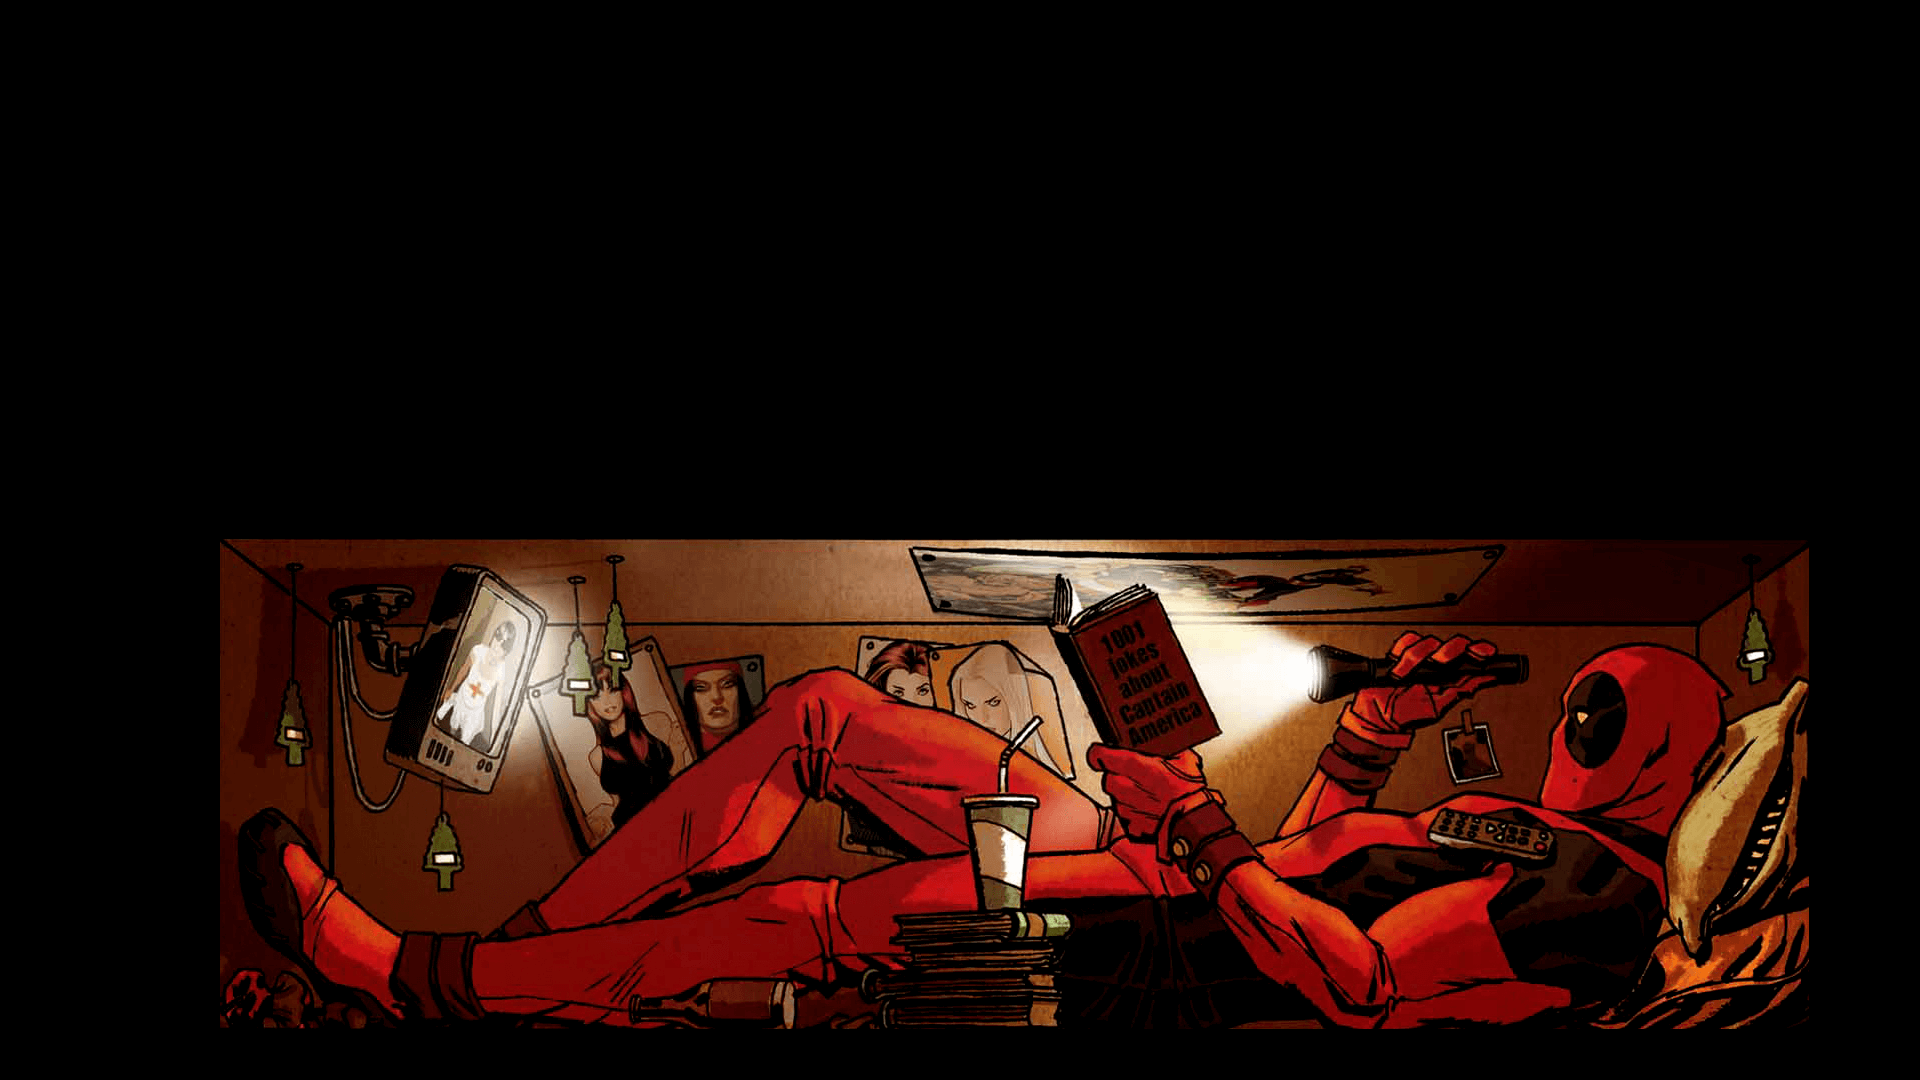 dead pool lendo com lanterna